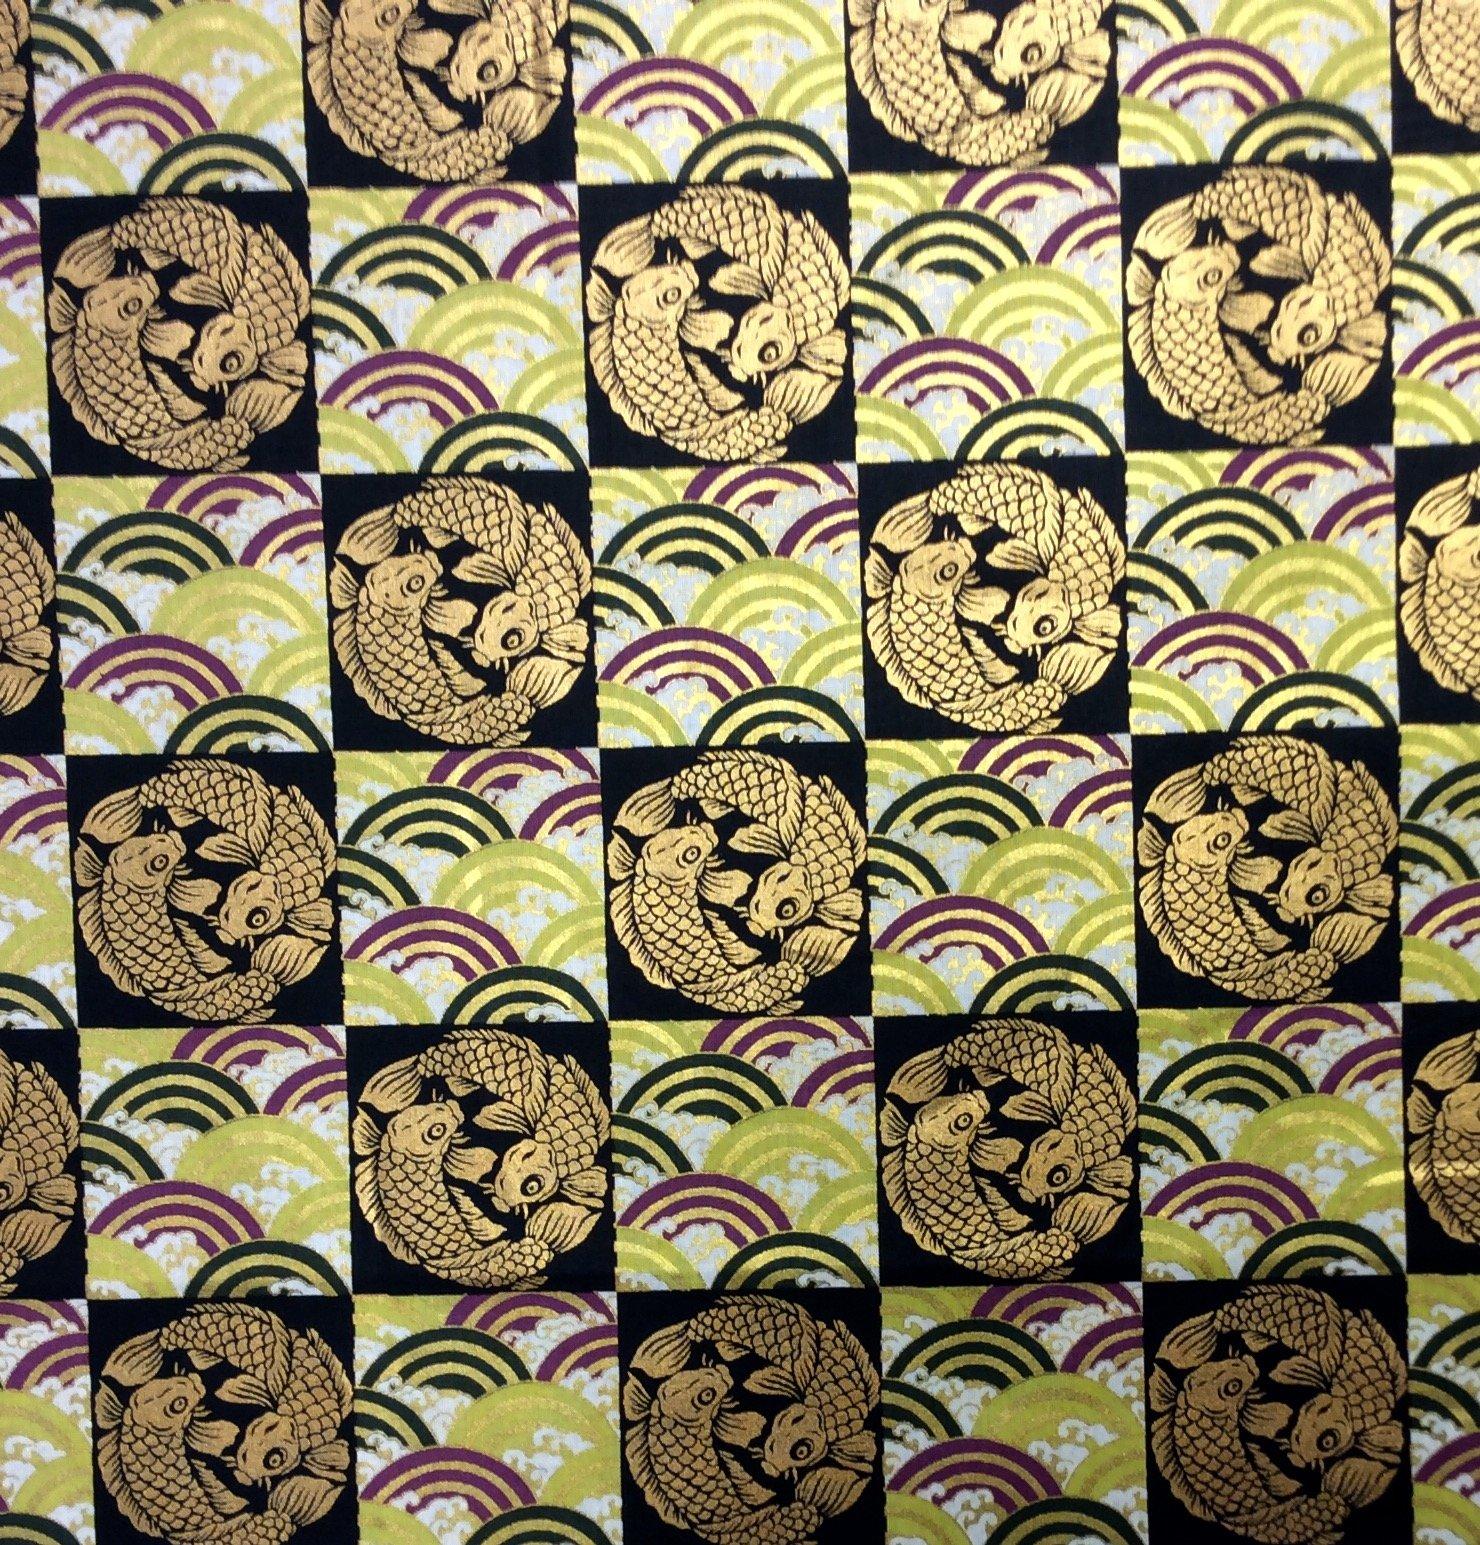 Last Piece! Koi Fish Japanese Asian Kimono Print Cotton Quilt Fabric PCNT54